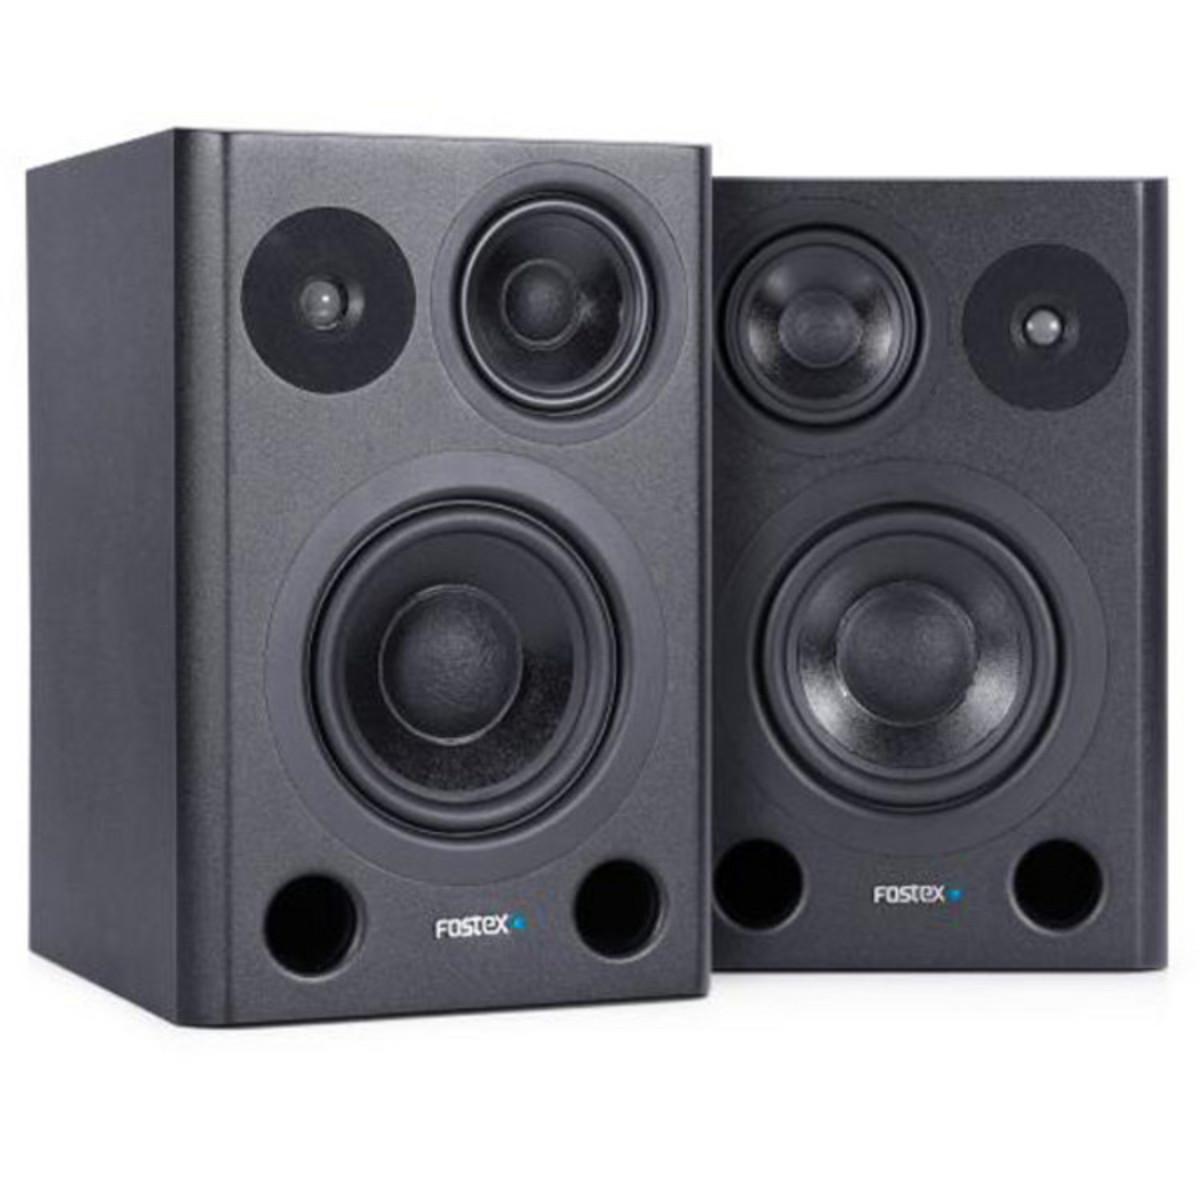 disc fostex pm641 professional 3 way studio monitors pair at gear4music. Black Bedroom Furniture Sets. Home Design Ideas